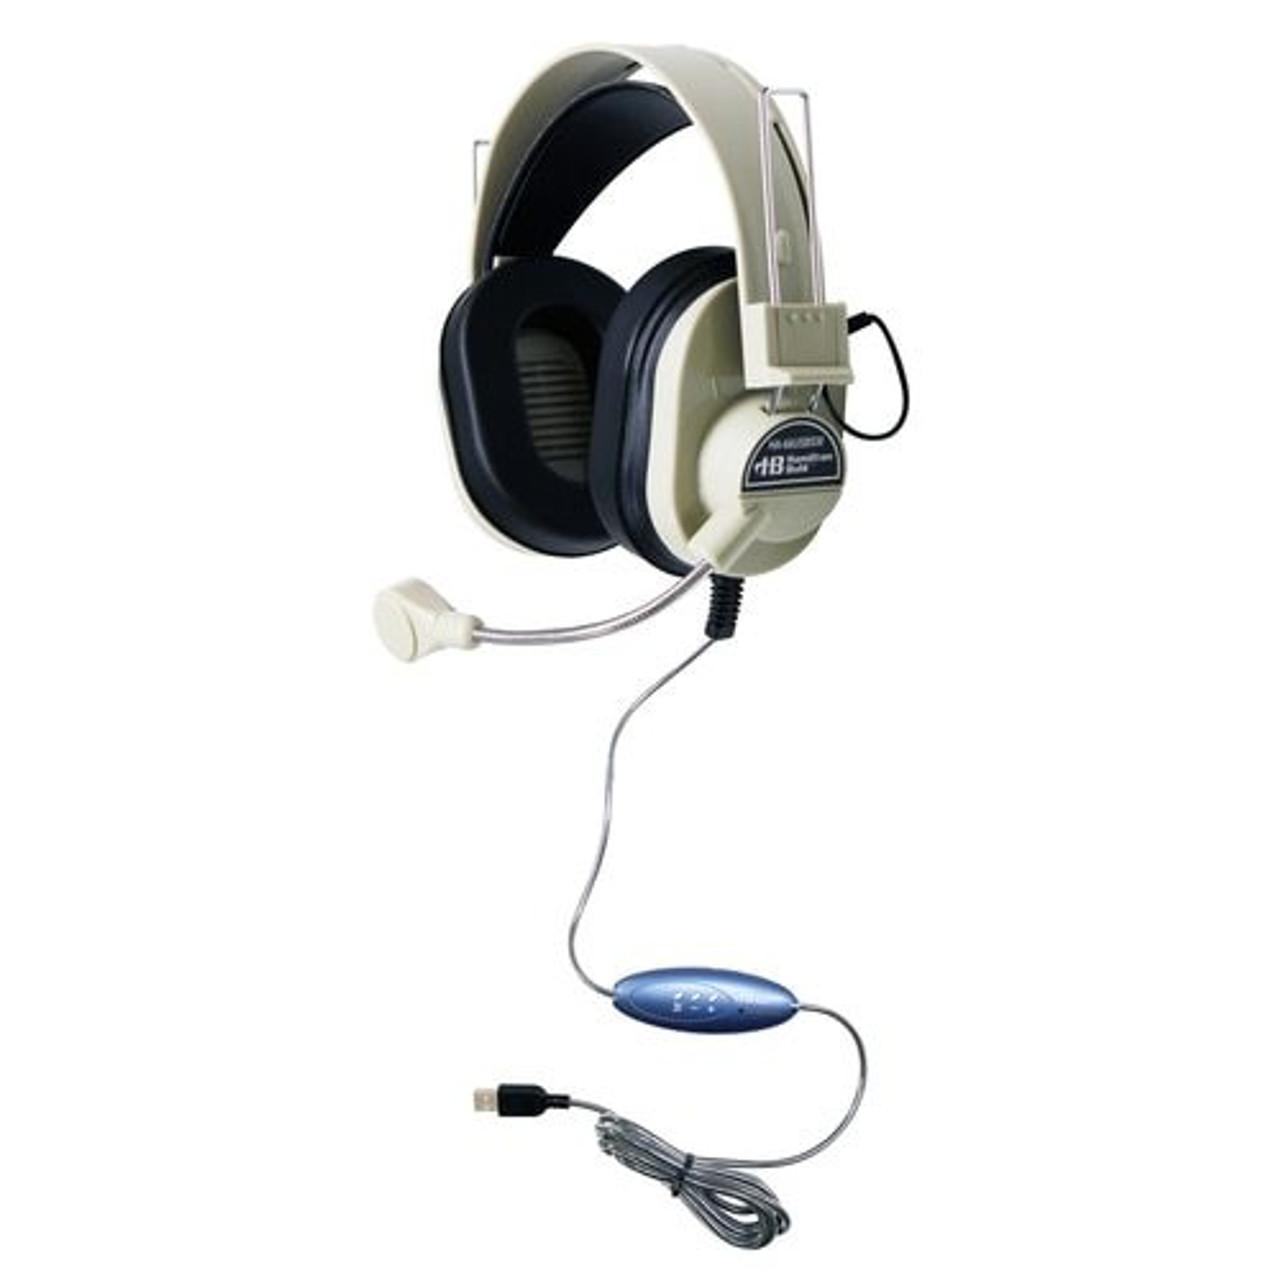 Deluxe Usb Headset With Gooseneck Microphone